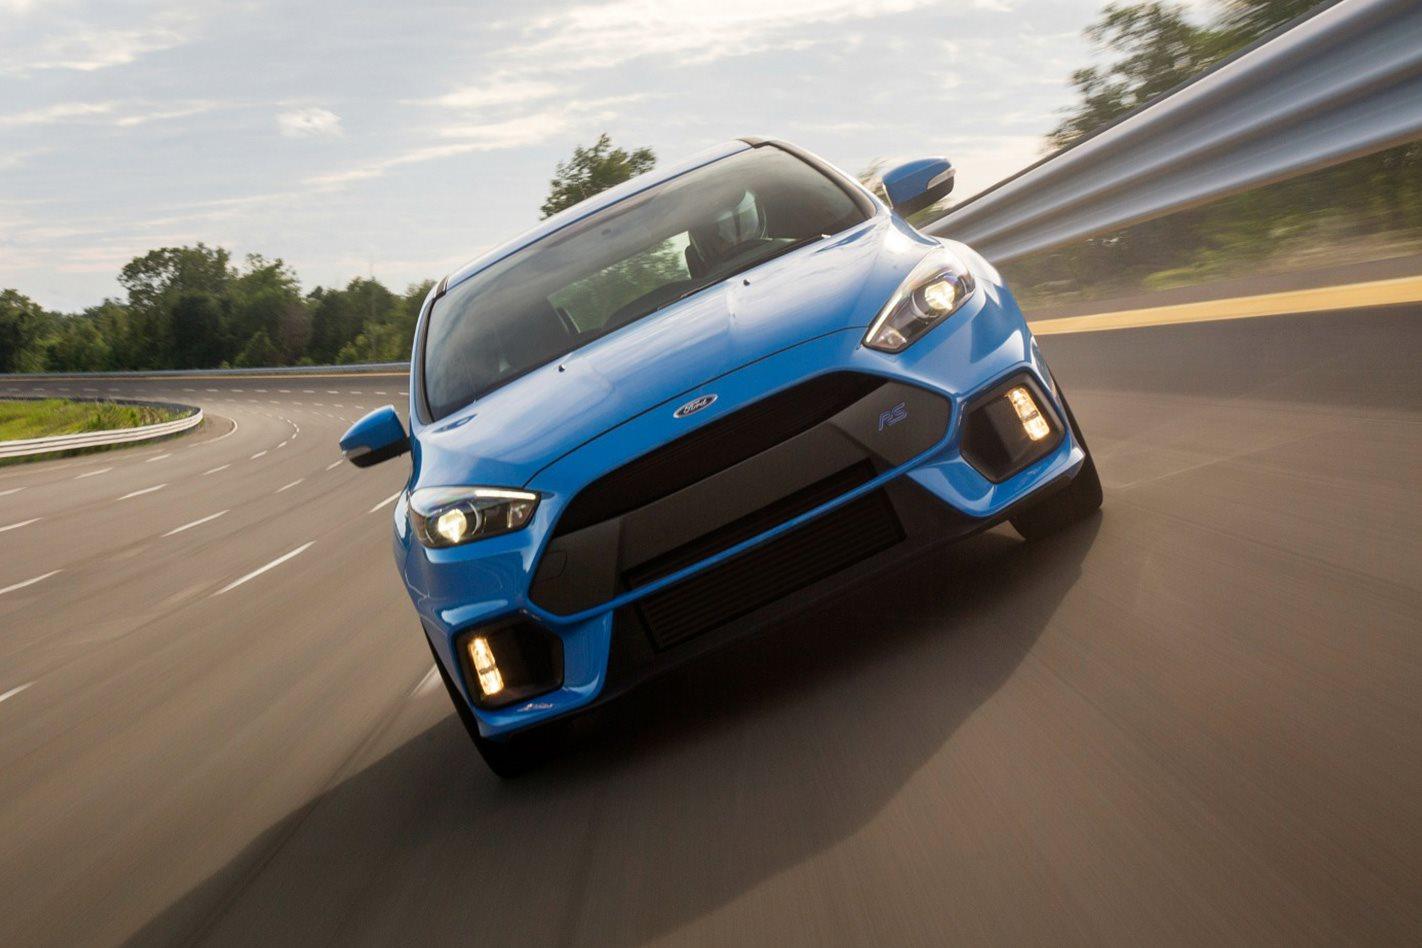 & Ford Focus RS track test | MOTOR markmcfarlin.com